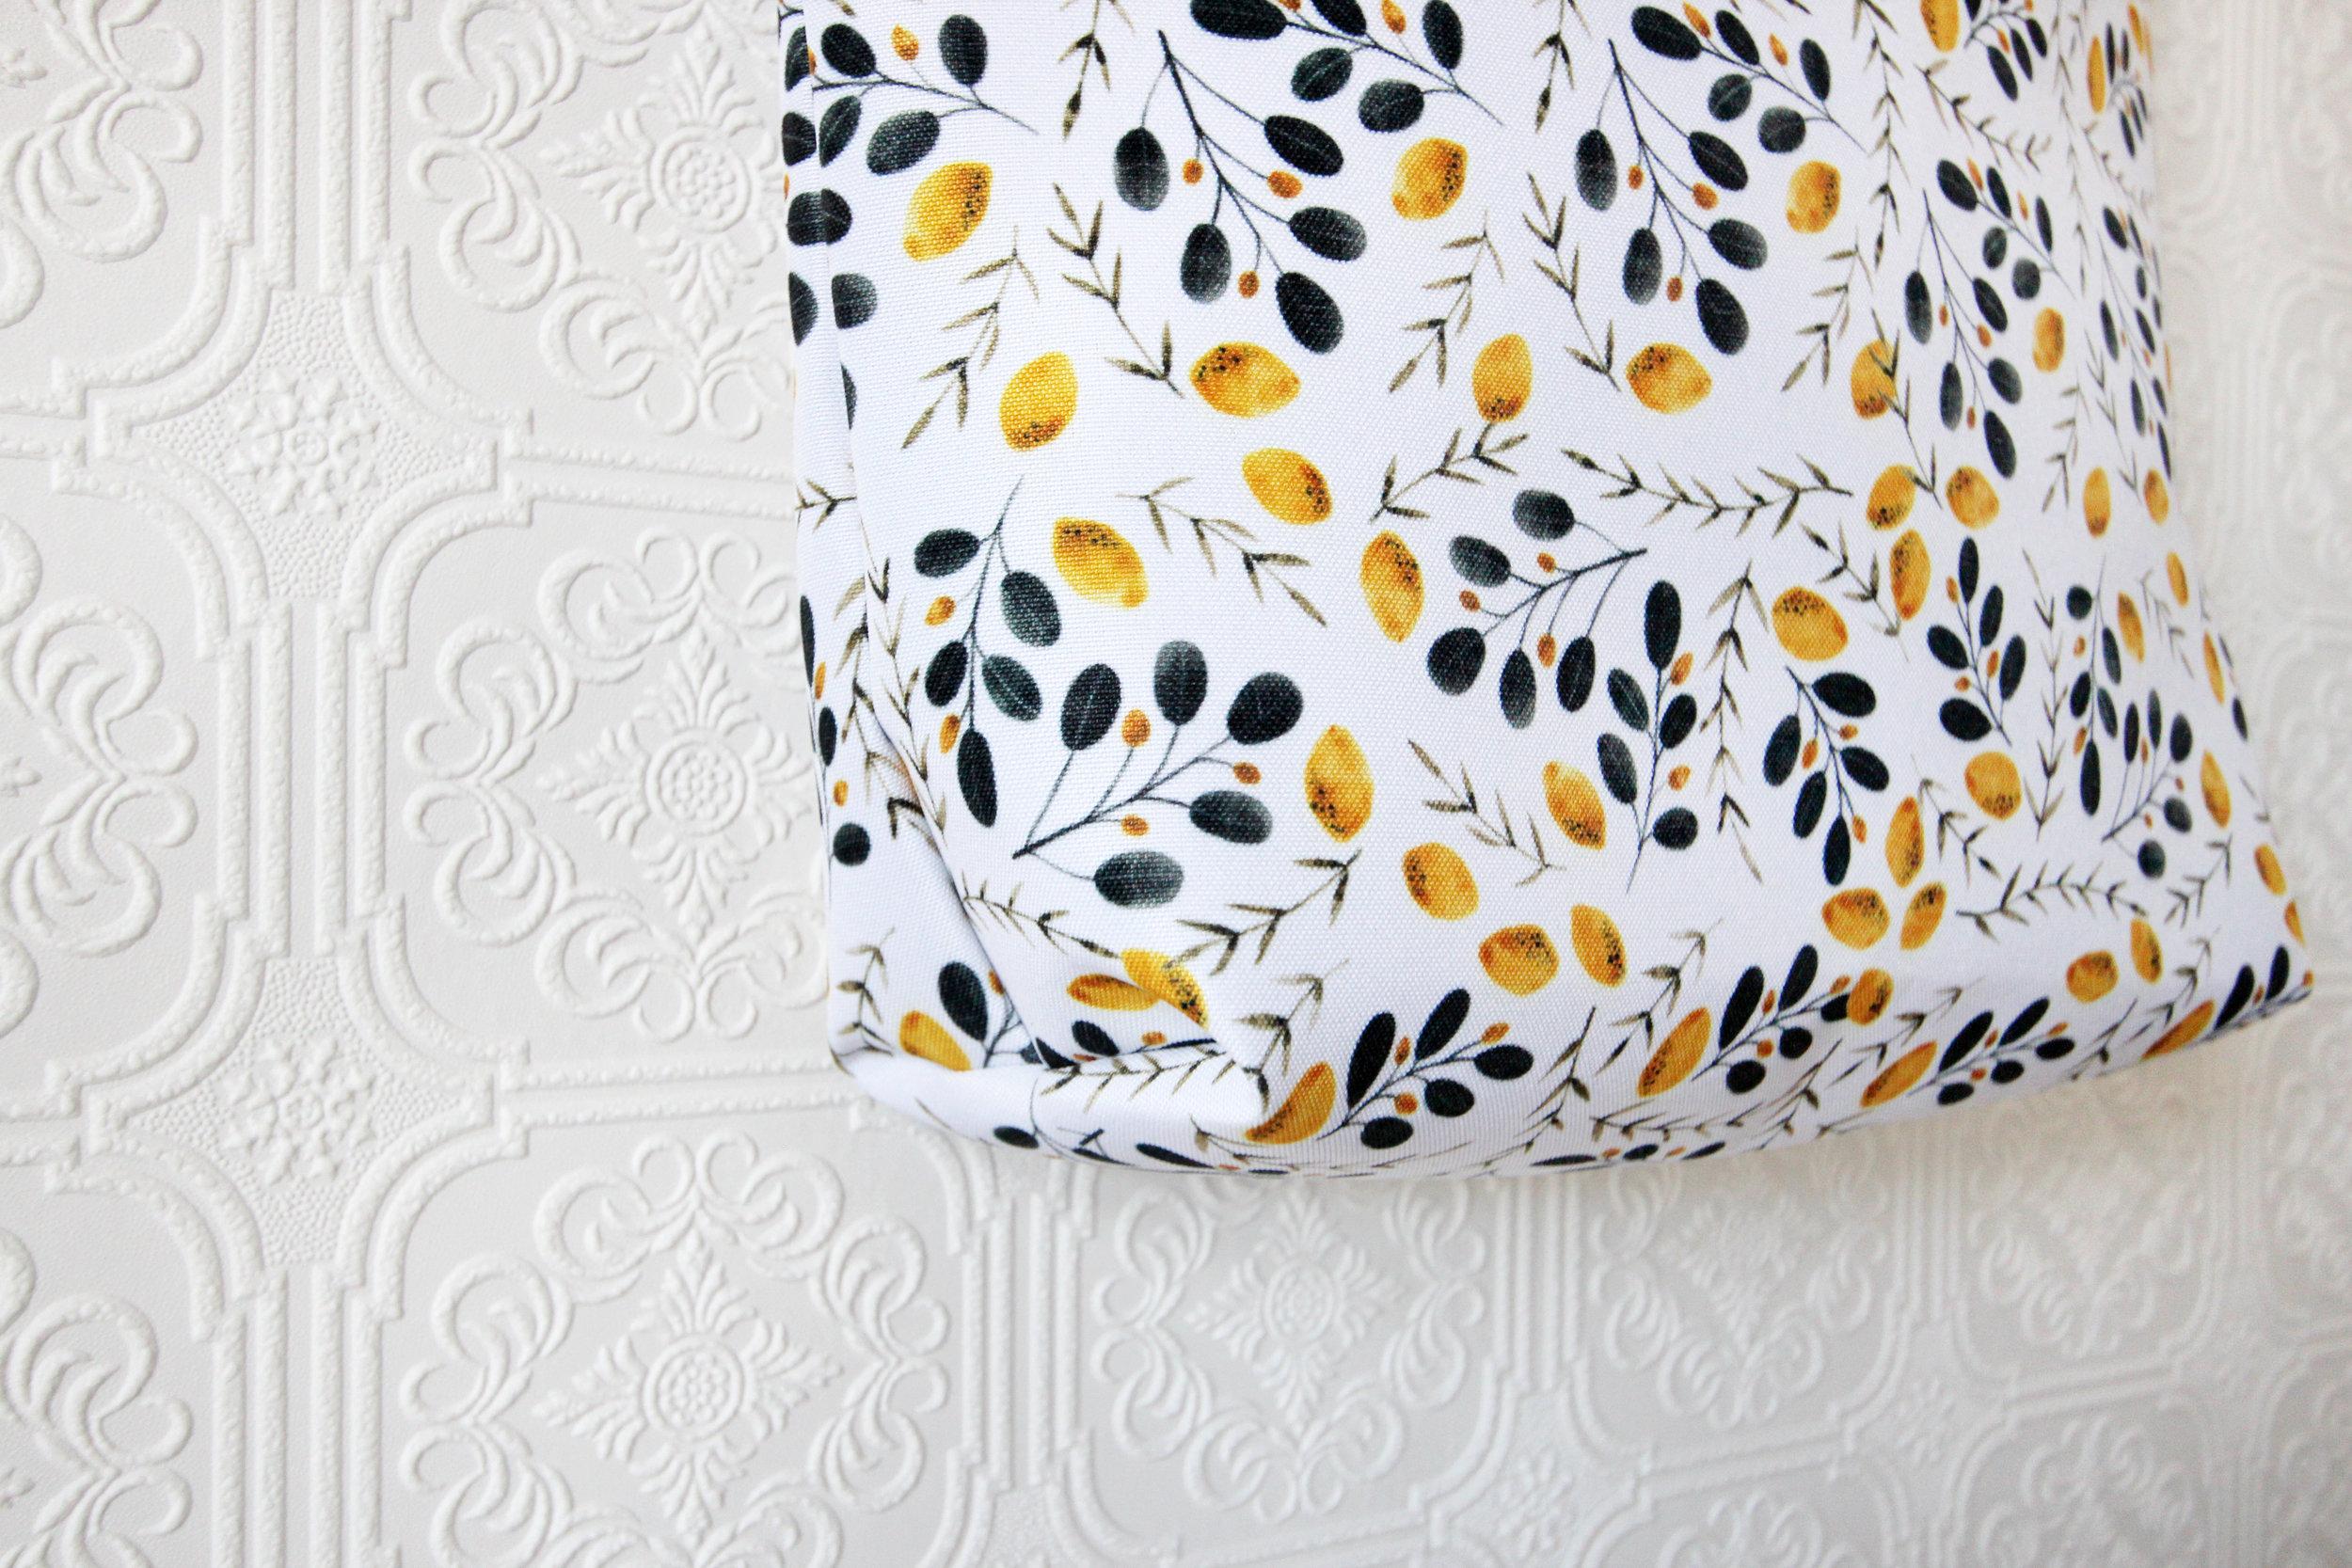 Maryclarewilkie-Lemons-4-Totesbag-marketbag-purse-watercolour.jpg